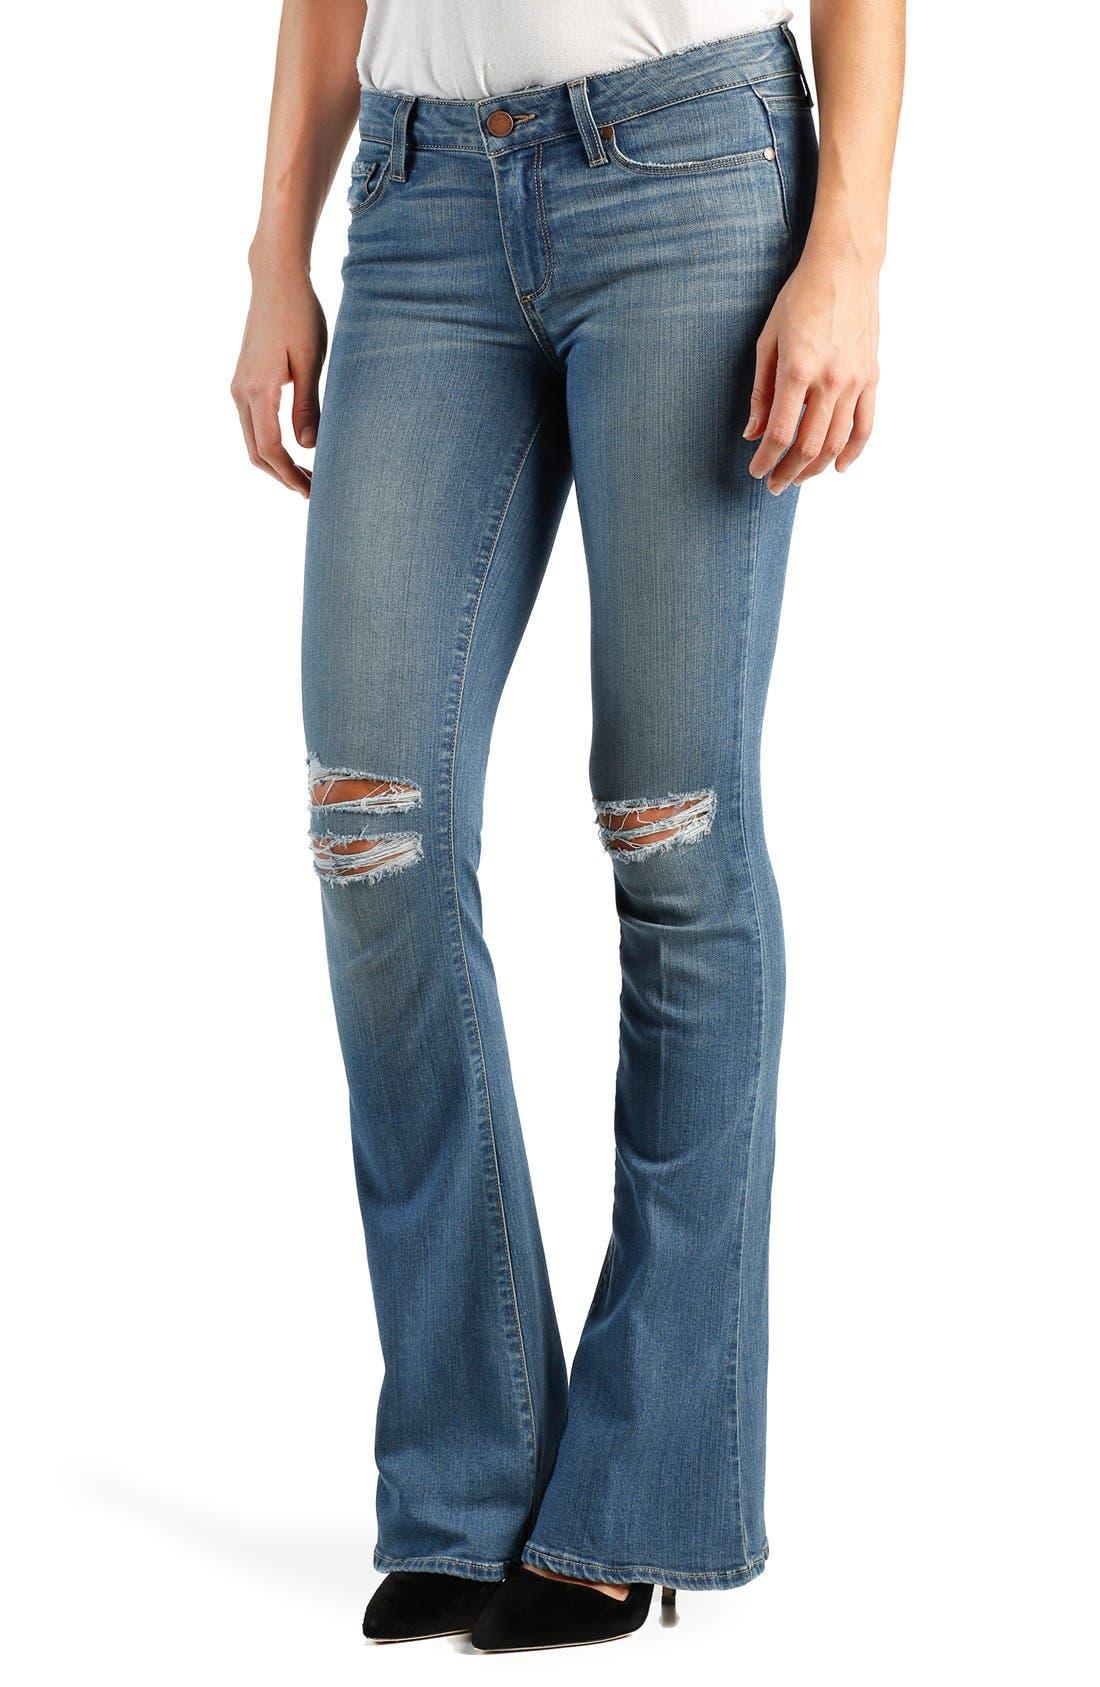 Alternate Image 1 Selected - Paige Denim 'Transcend - Lou Lou' Flare Jeans (Joelle)